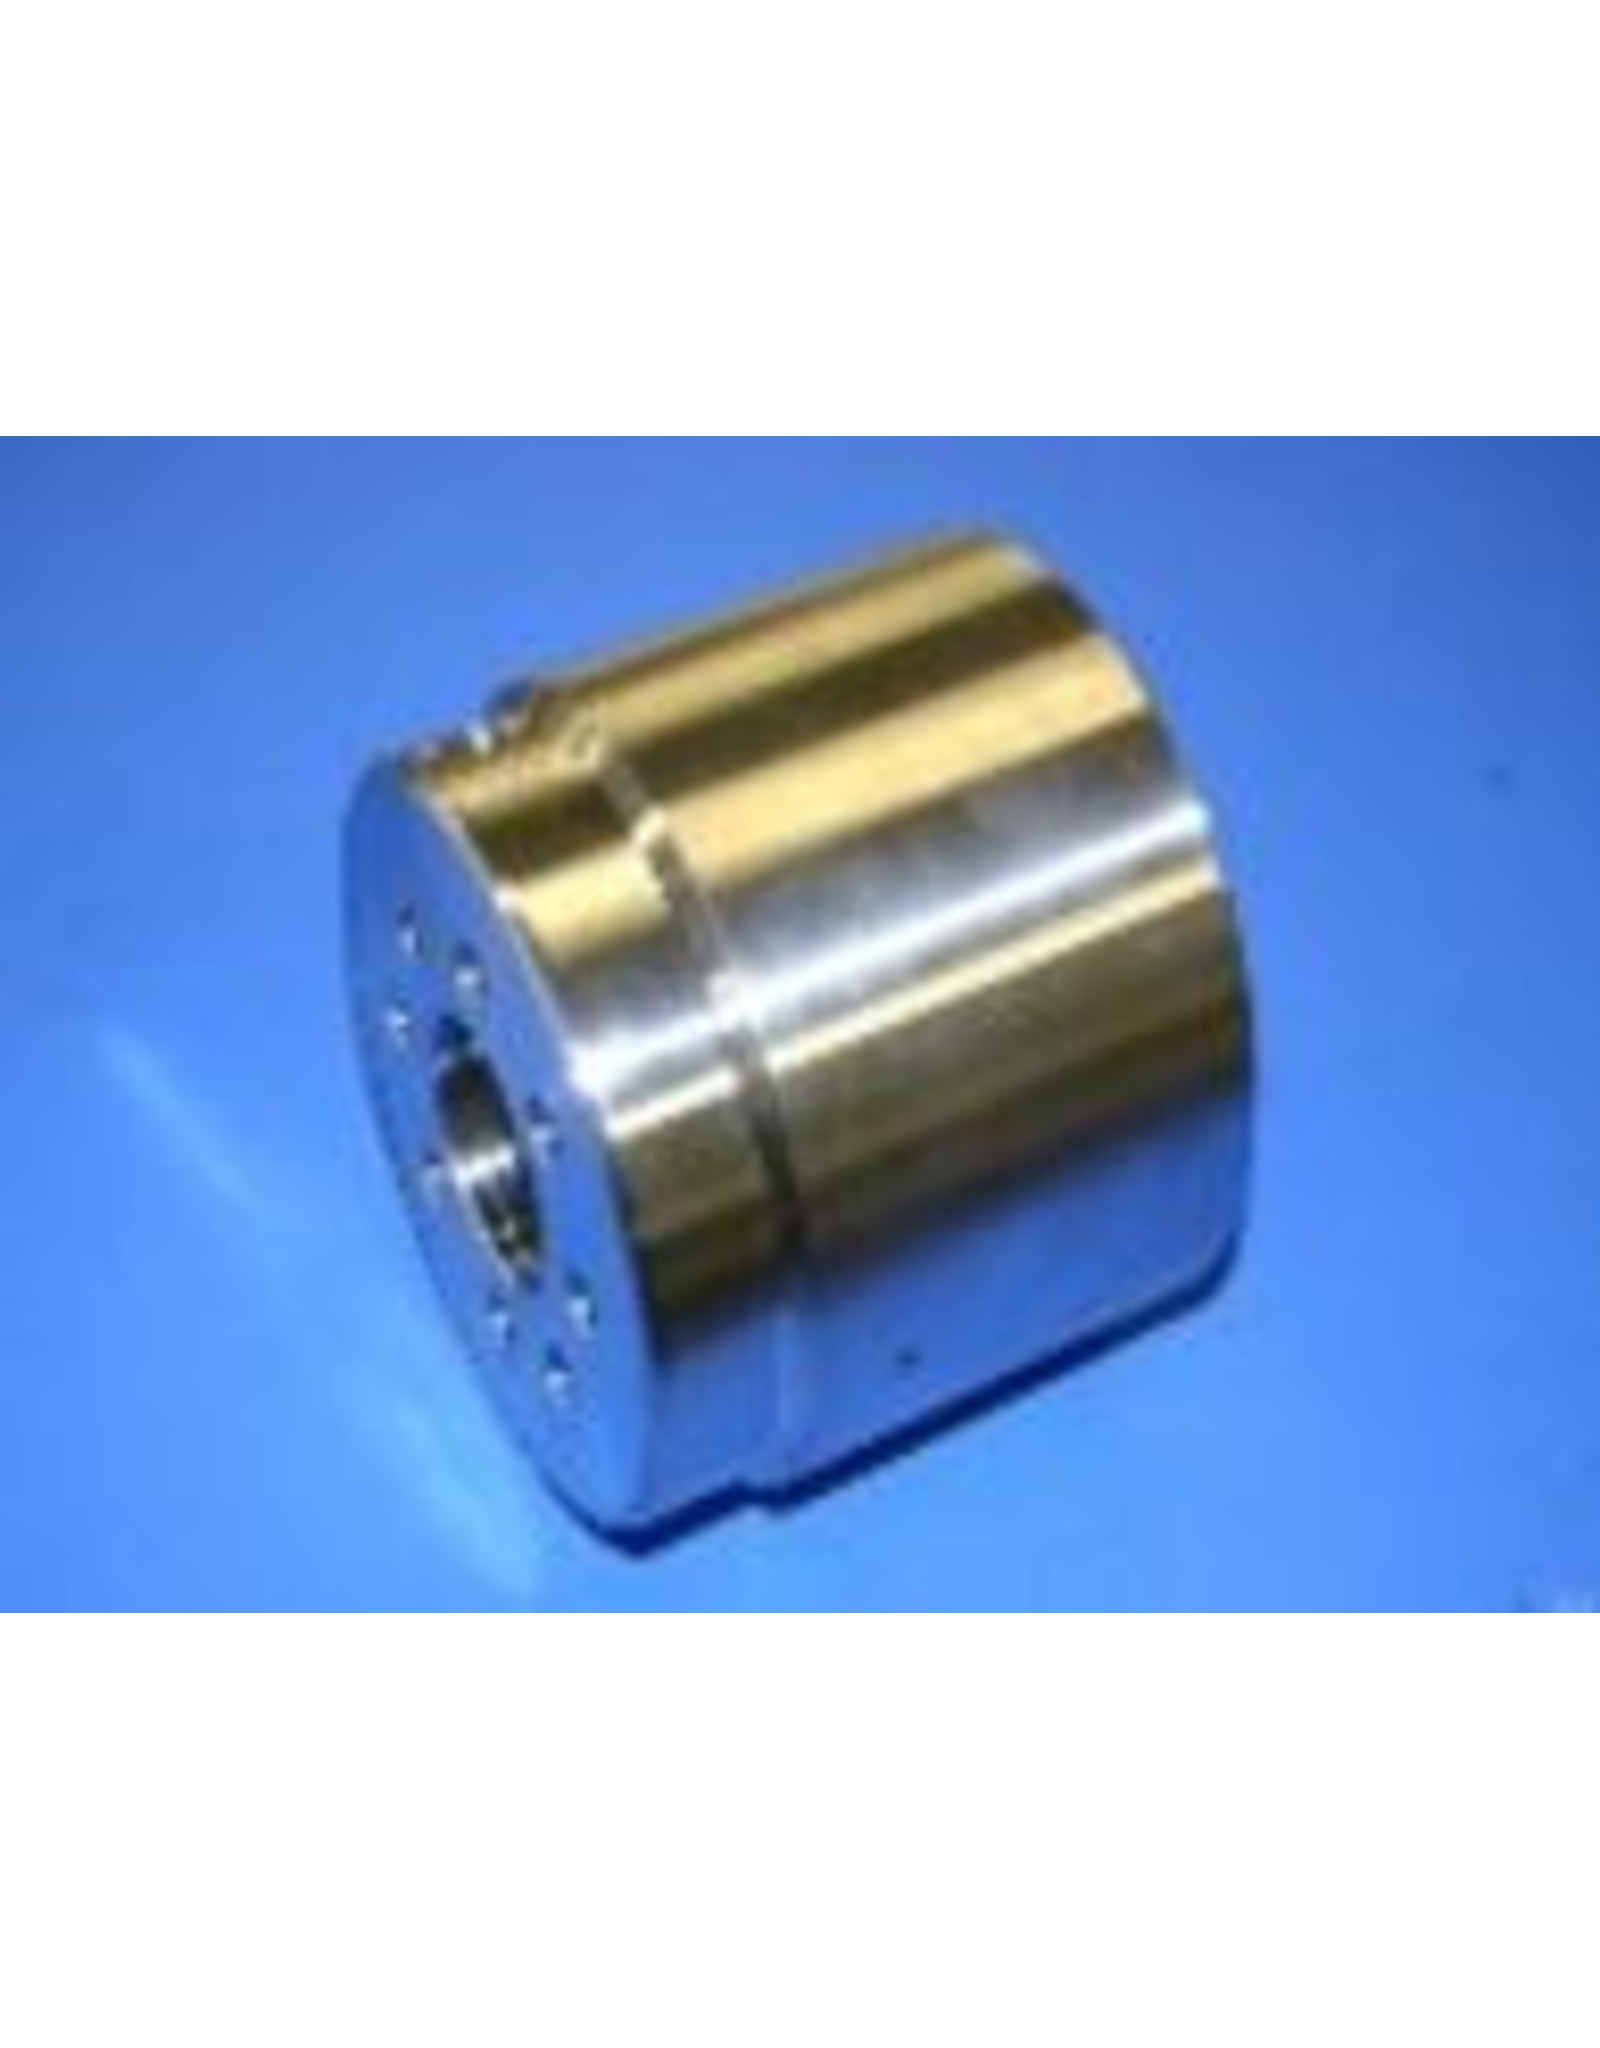 KMT Style Nut, High Pressure Cylinder, SL5, 100S